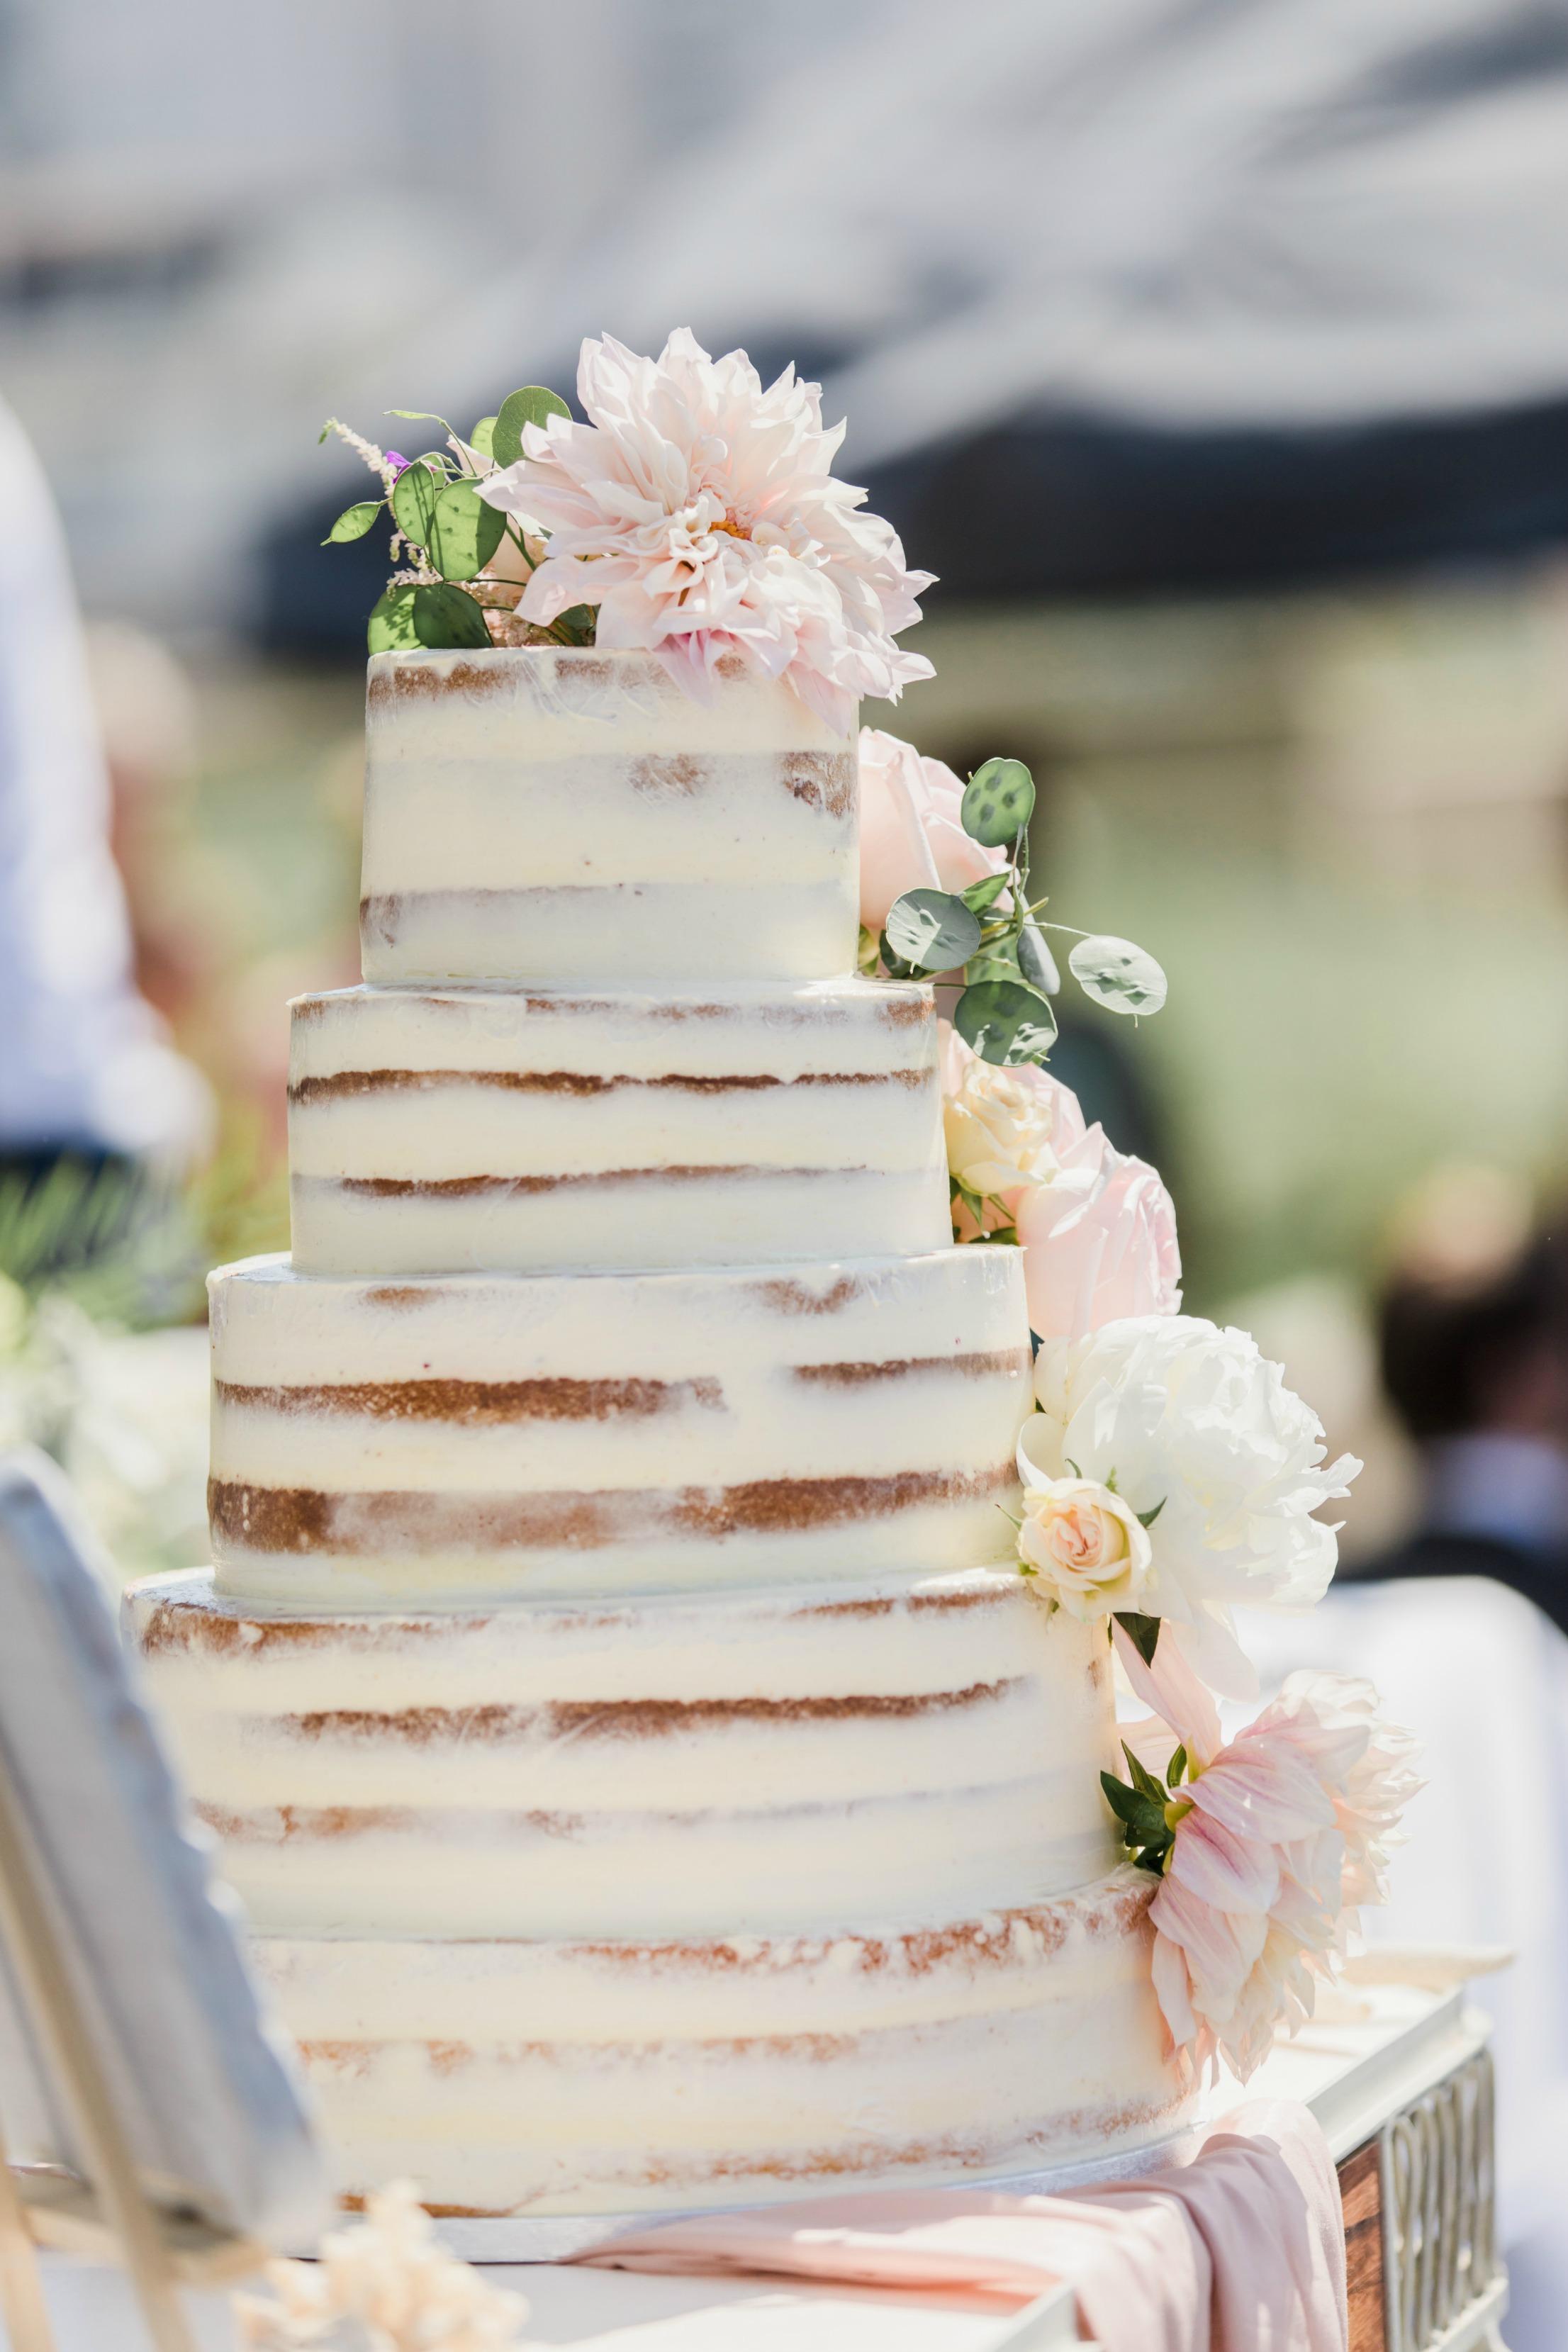 seminaked-naked-cake, rustic-seminaked-wedding-cake, bruidstaart-rustic-oudroze